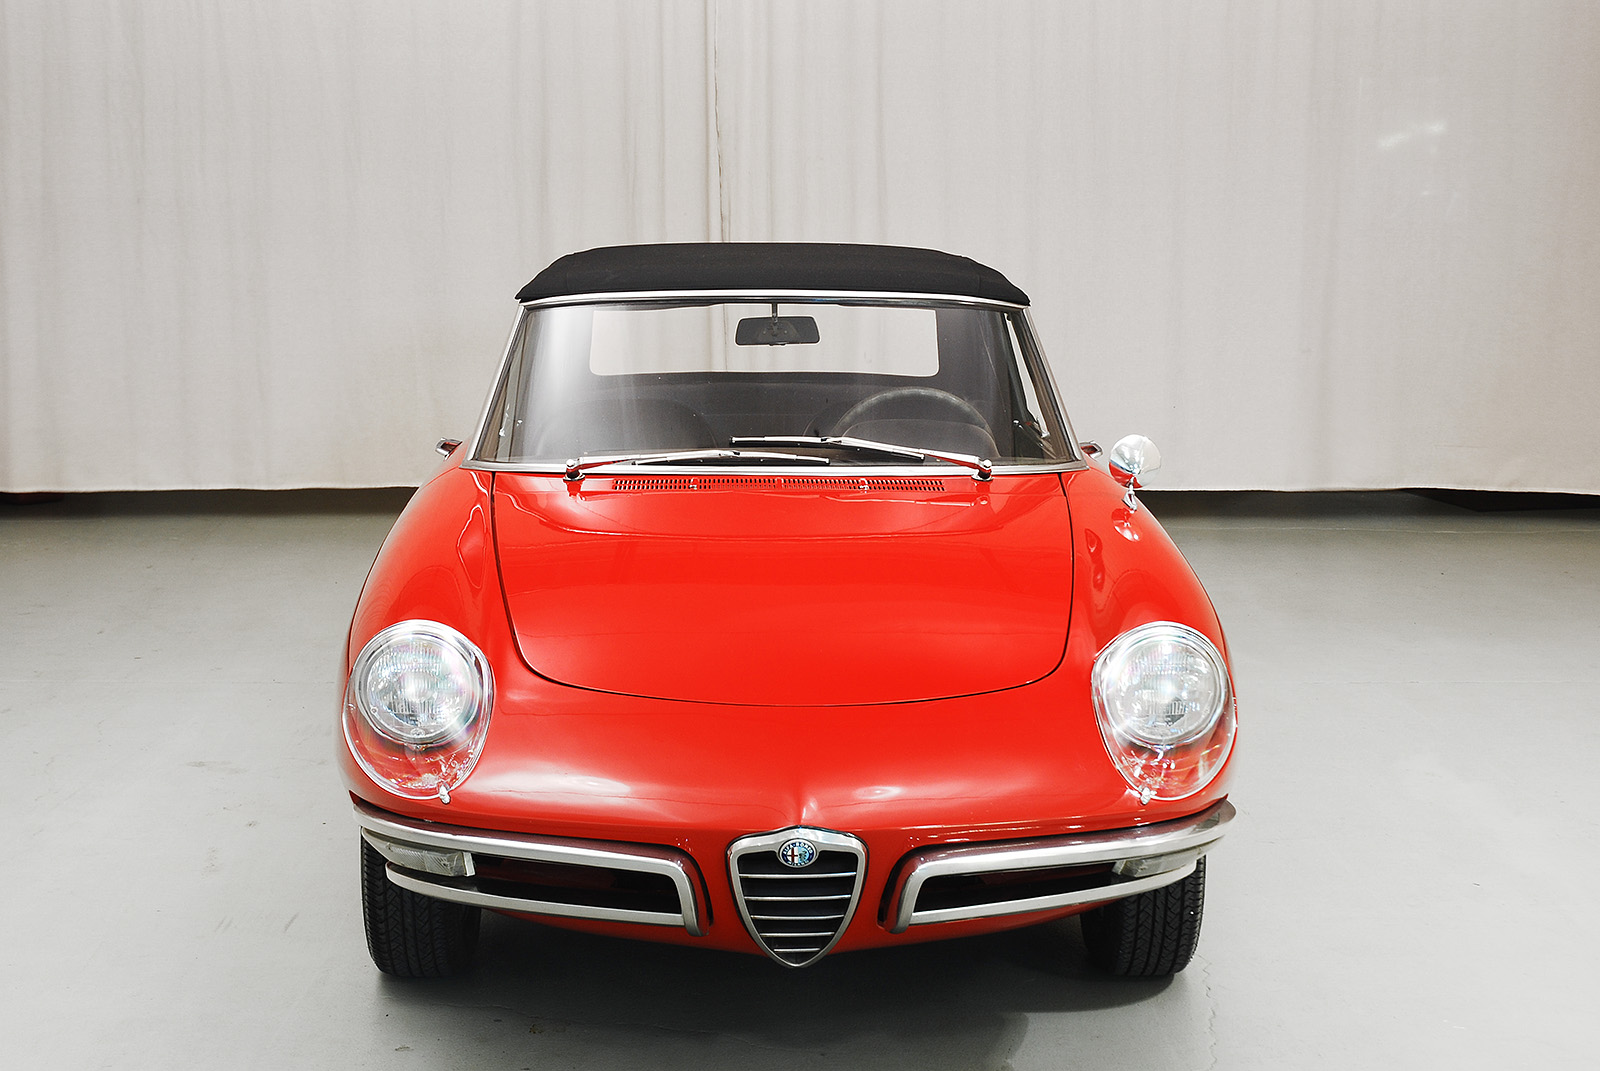 Alfa Romeo Giulia 2014 >> 1967 Alfa Romeo Duetto Spyder | Hyman Ltd. Classic Cars